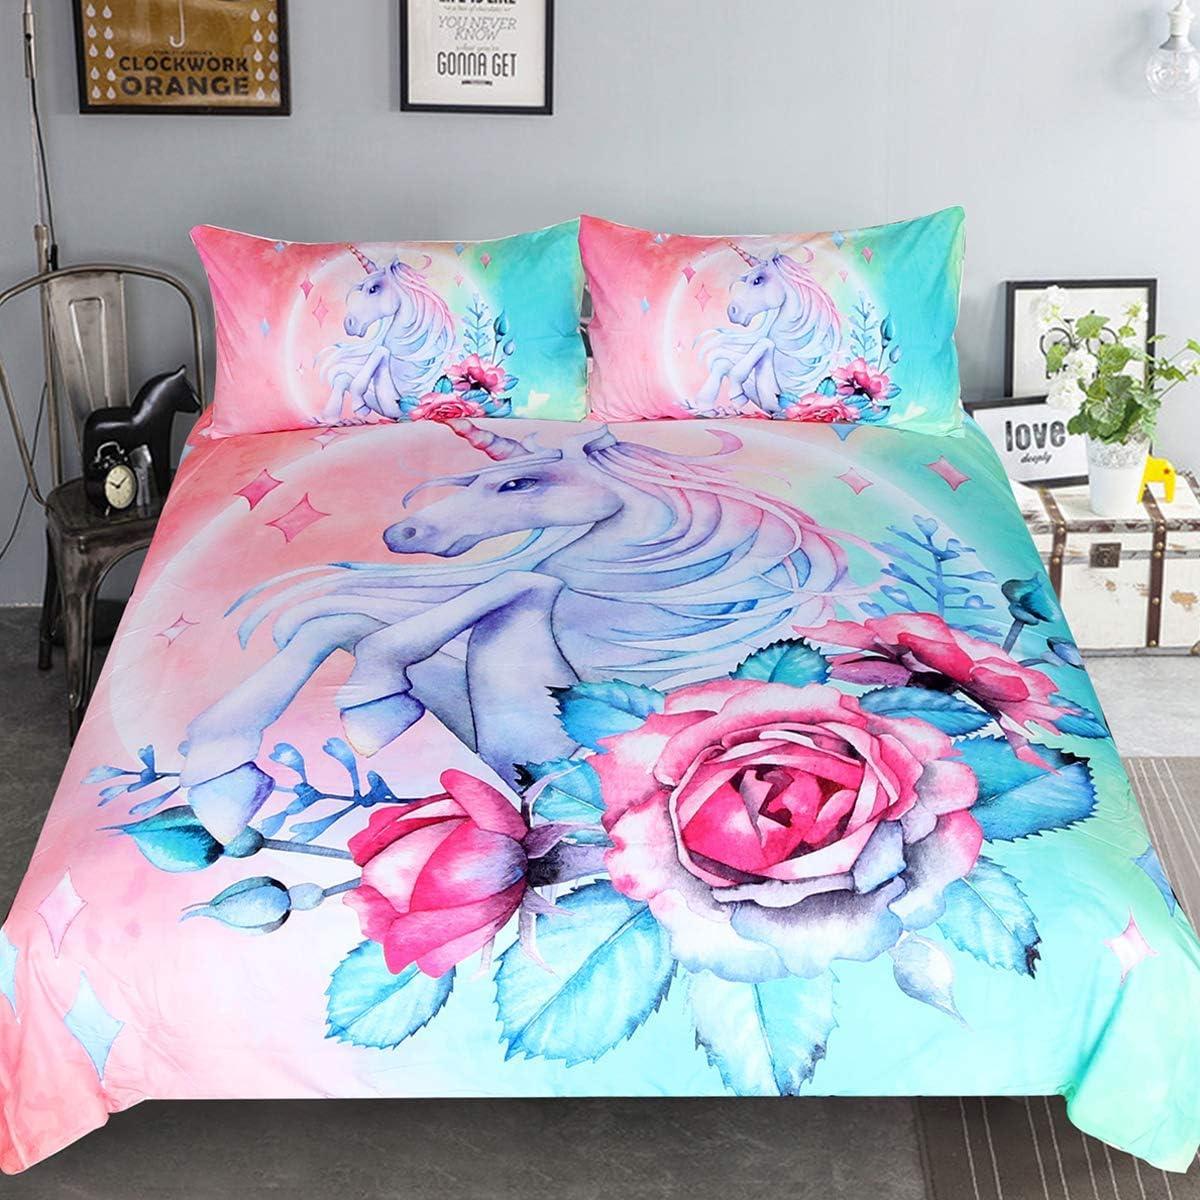 Sleepwish Unicorn Bedding Teen Magical Horse Rose Bedspreads 3 Piece Rose Pink Blue Bedding Unicorn Lovers Bedding Duvet Doona Cover Set (Full)